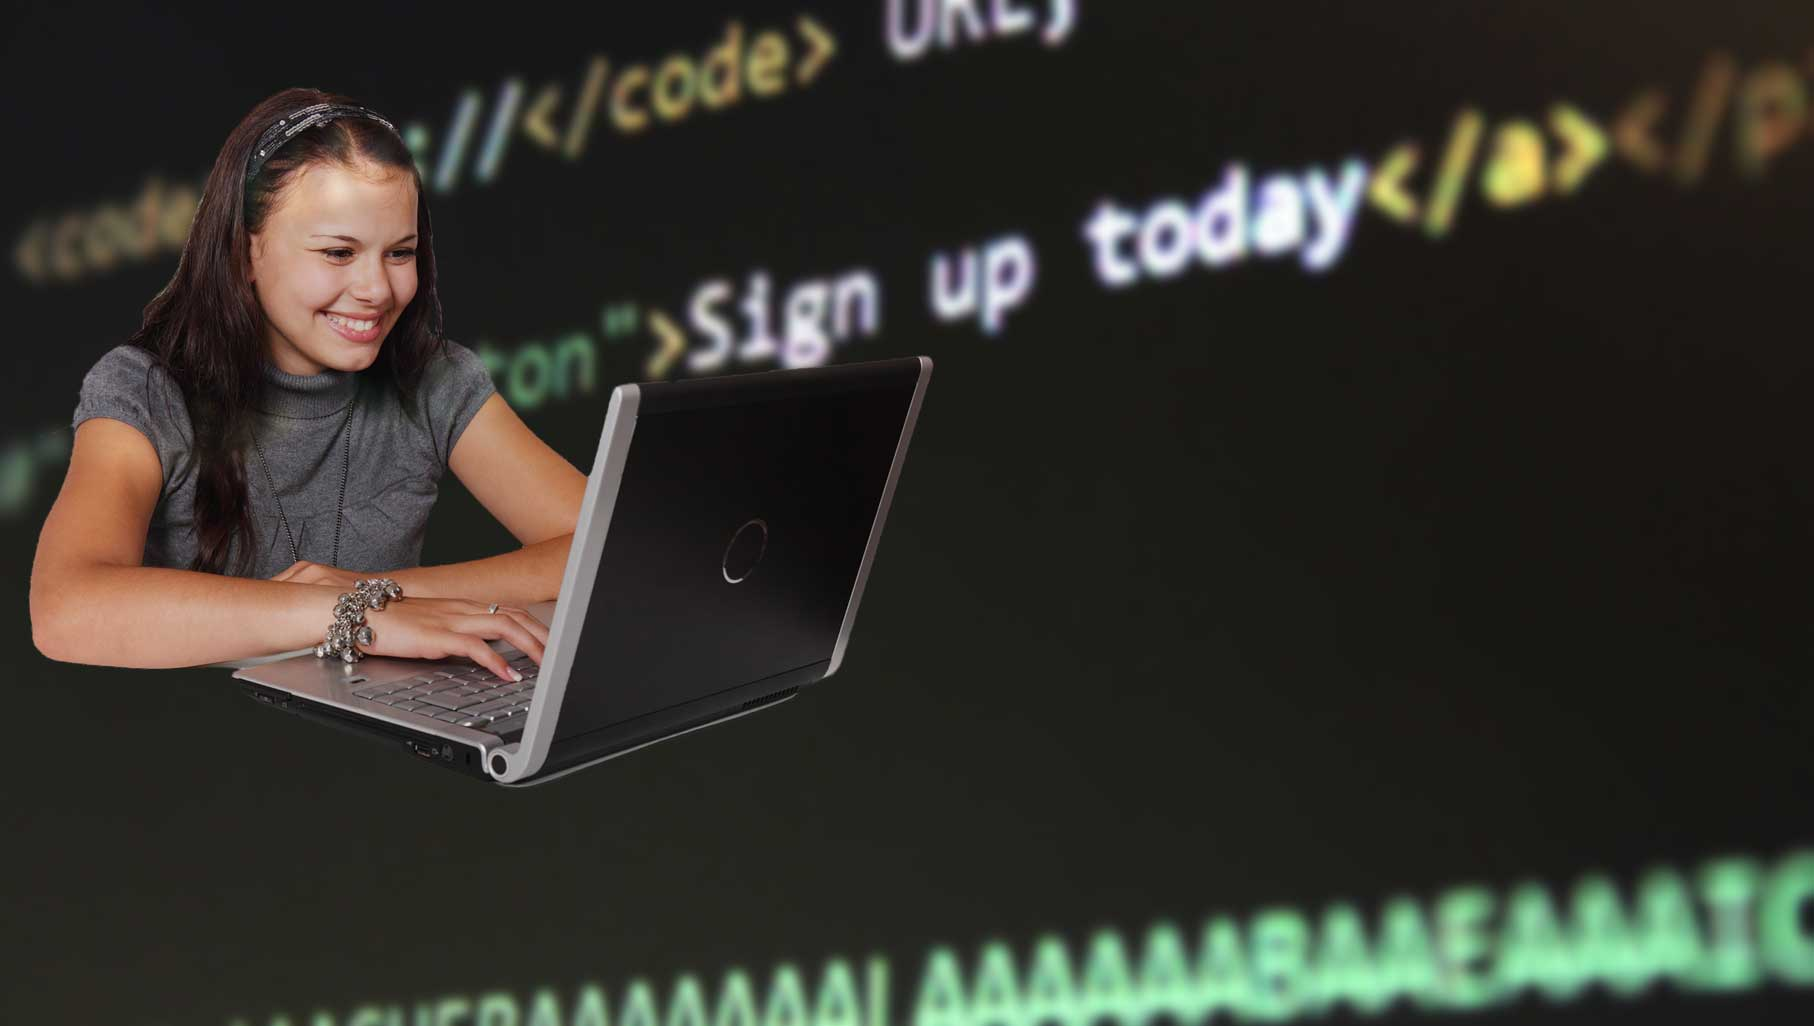 coding gordon design